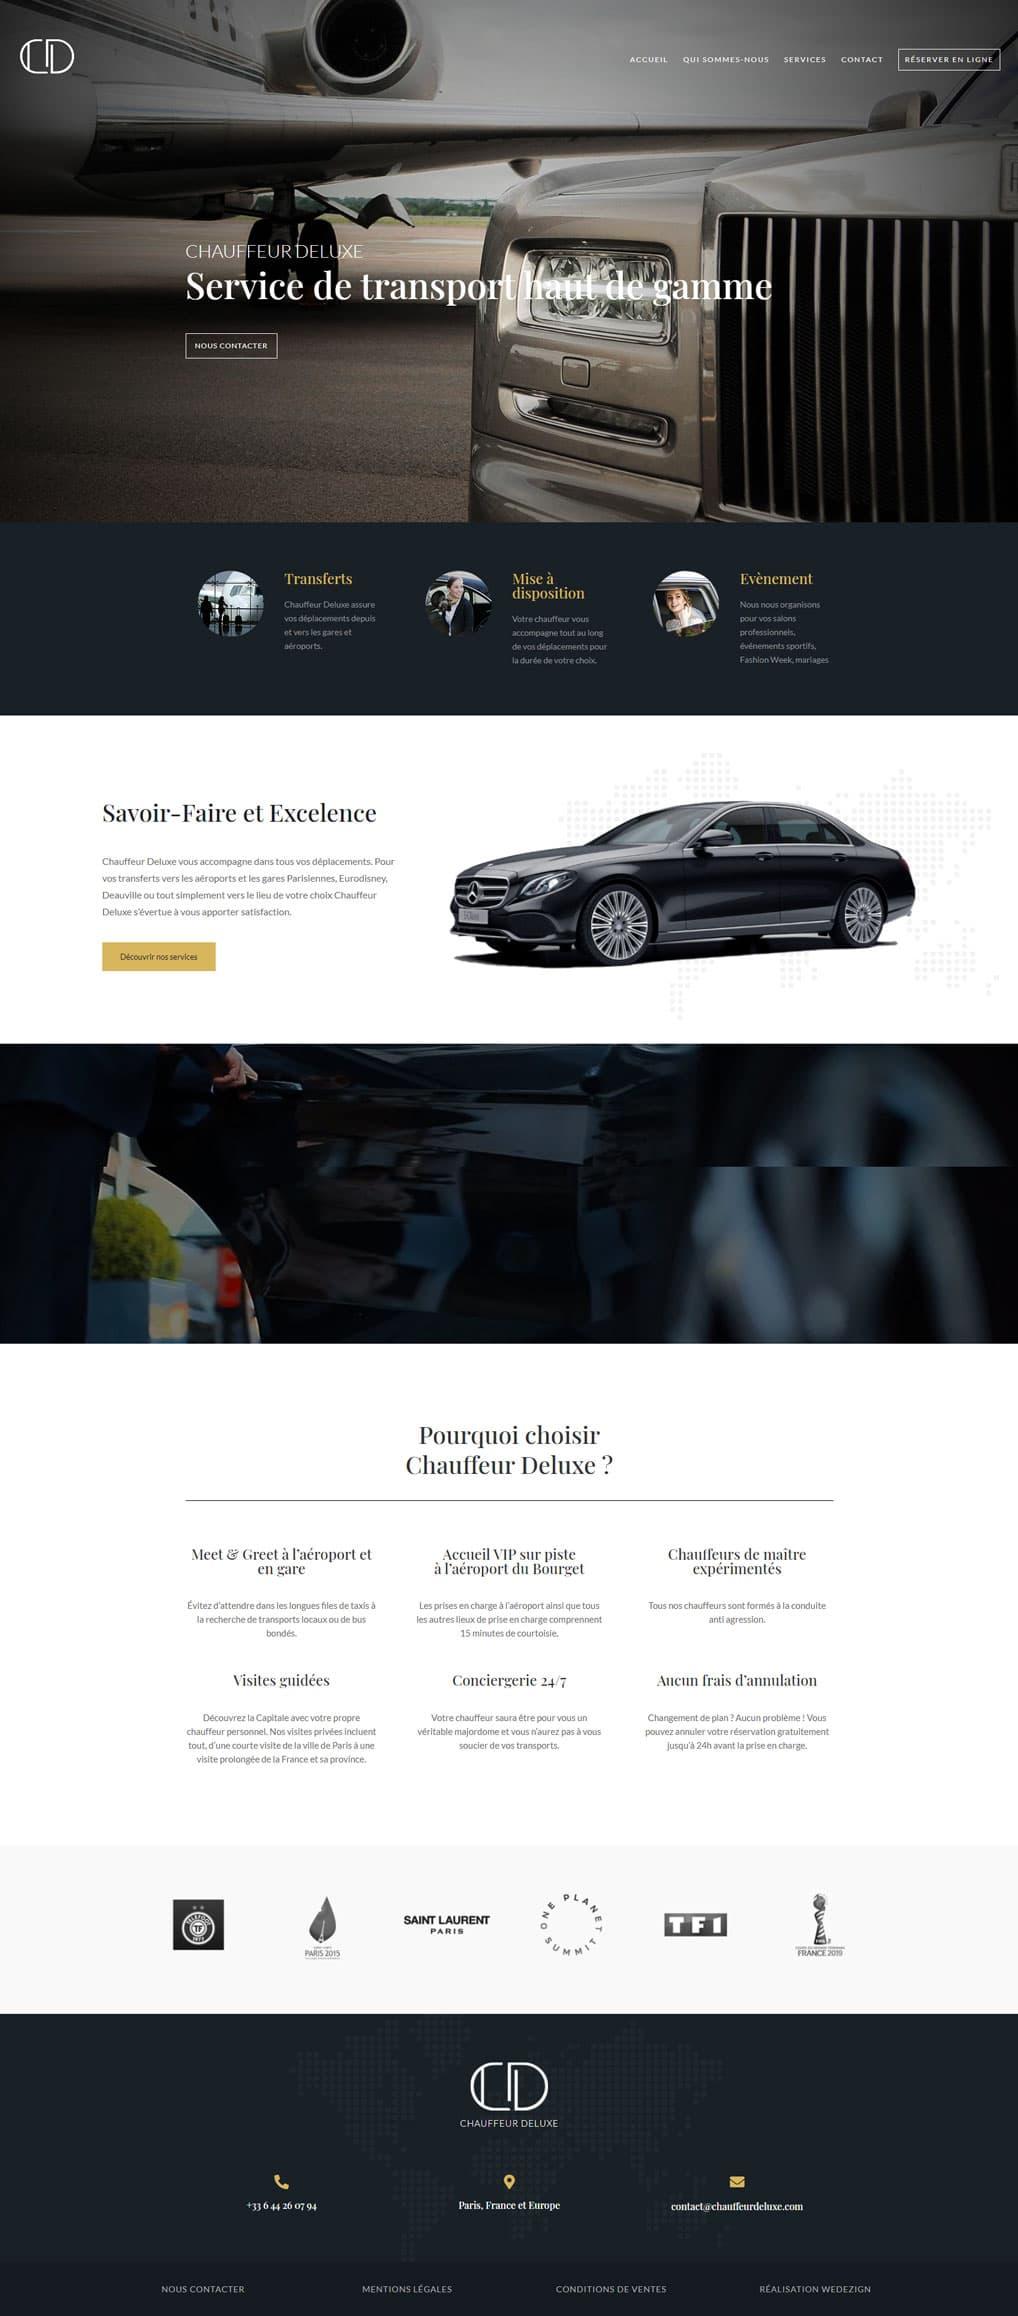 Maquette site web accueil chauffeur deluxe